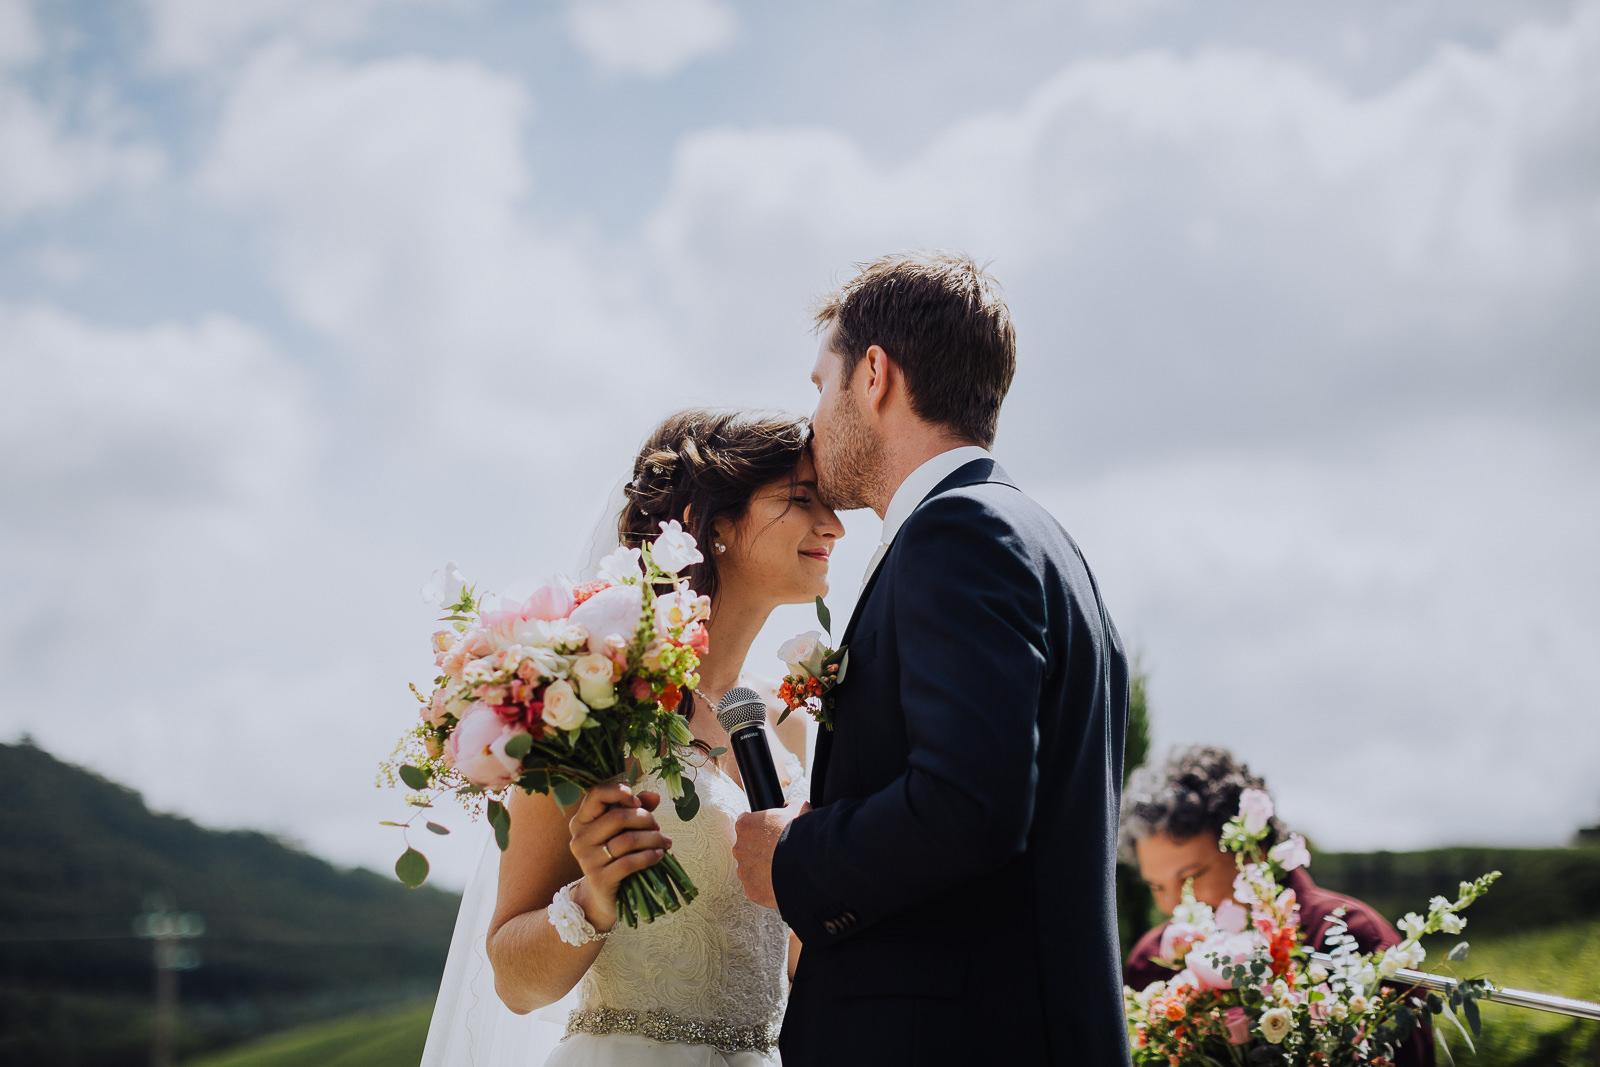 wedding_quinta_santana_mafra_portugal_040.jpg